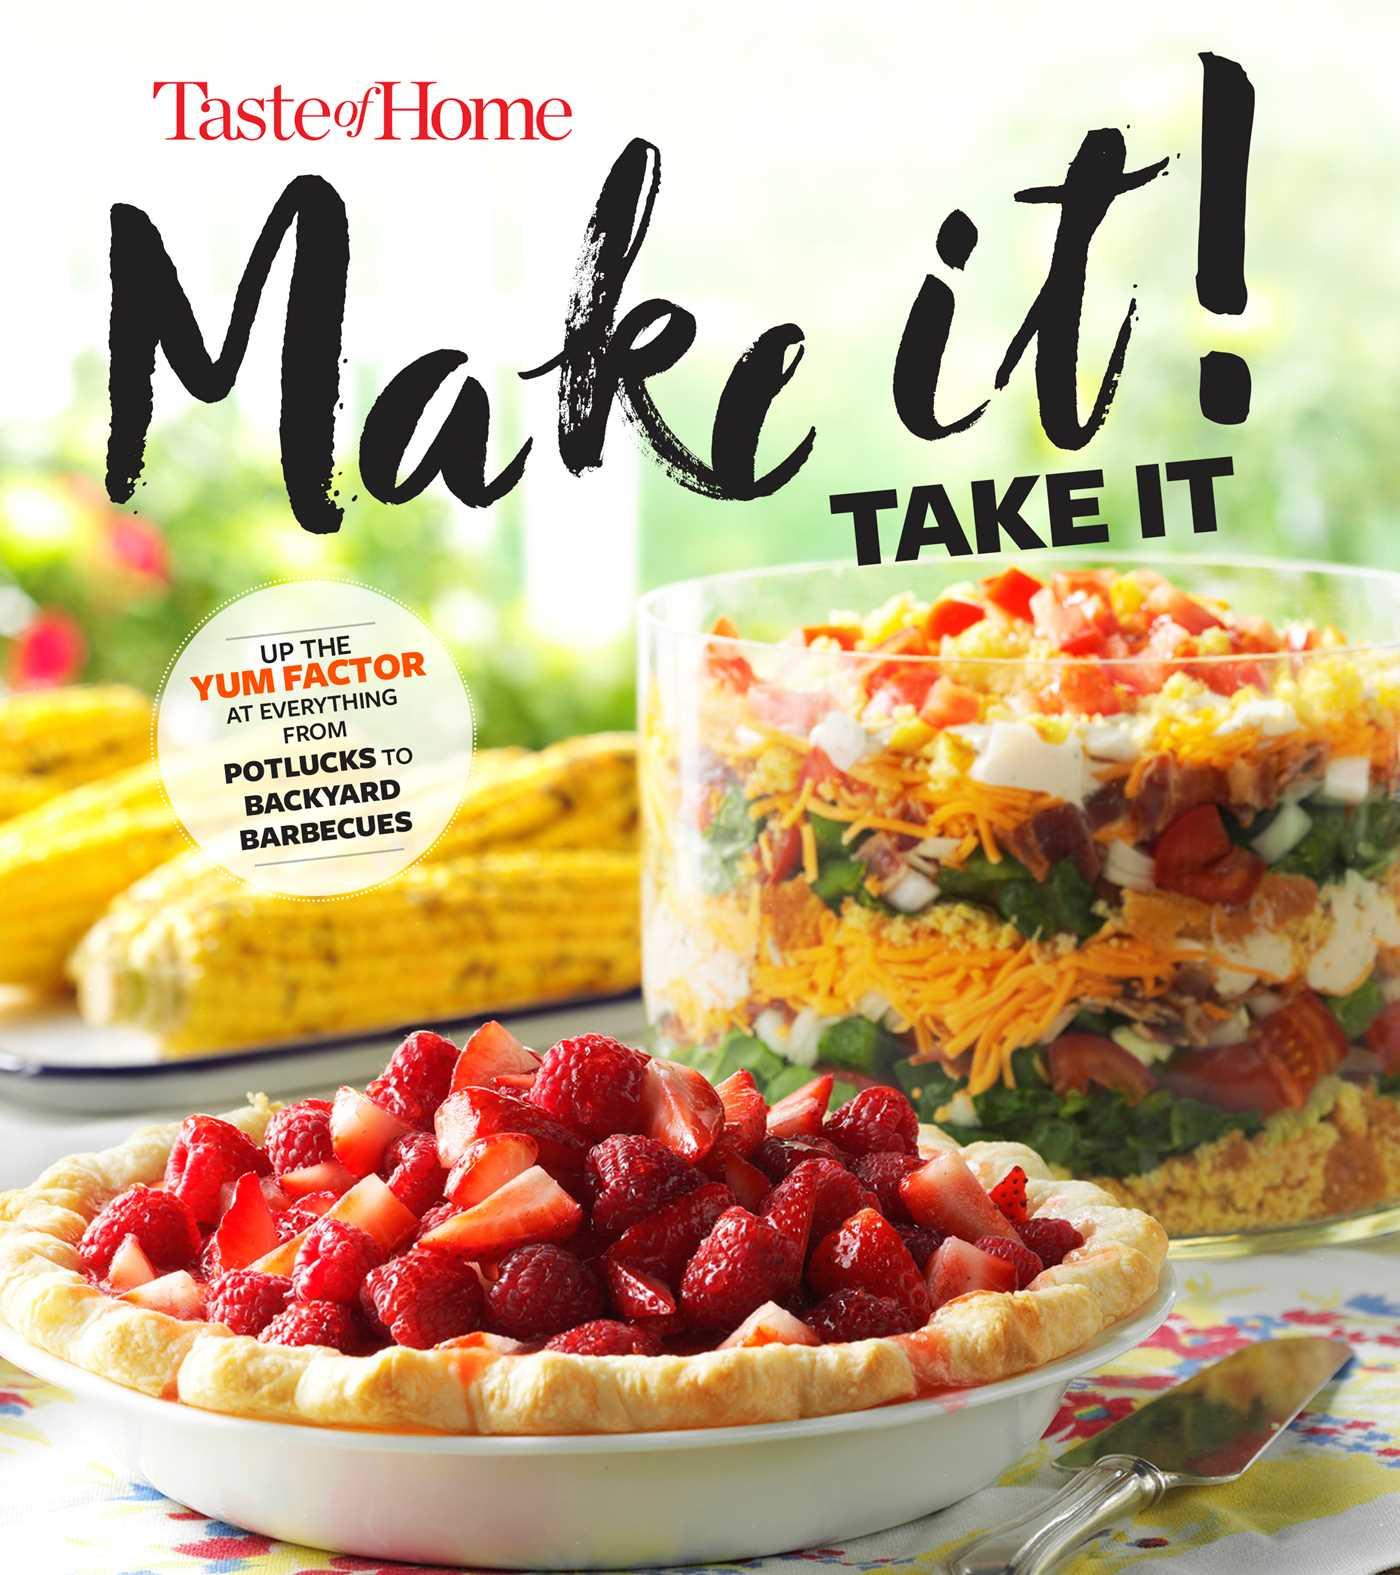 Taste of home make it take it cookbook 9781617657399 hr